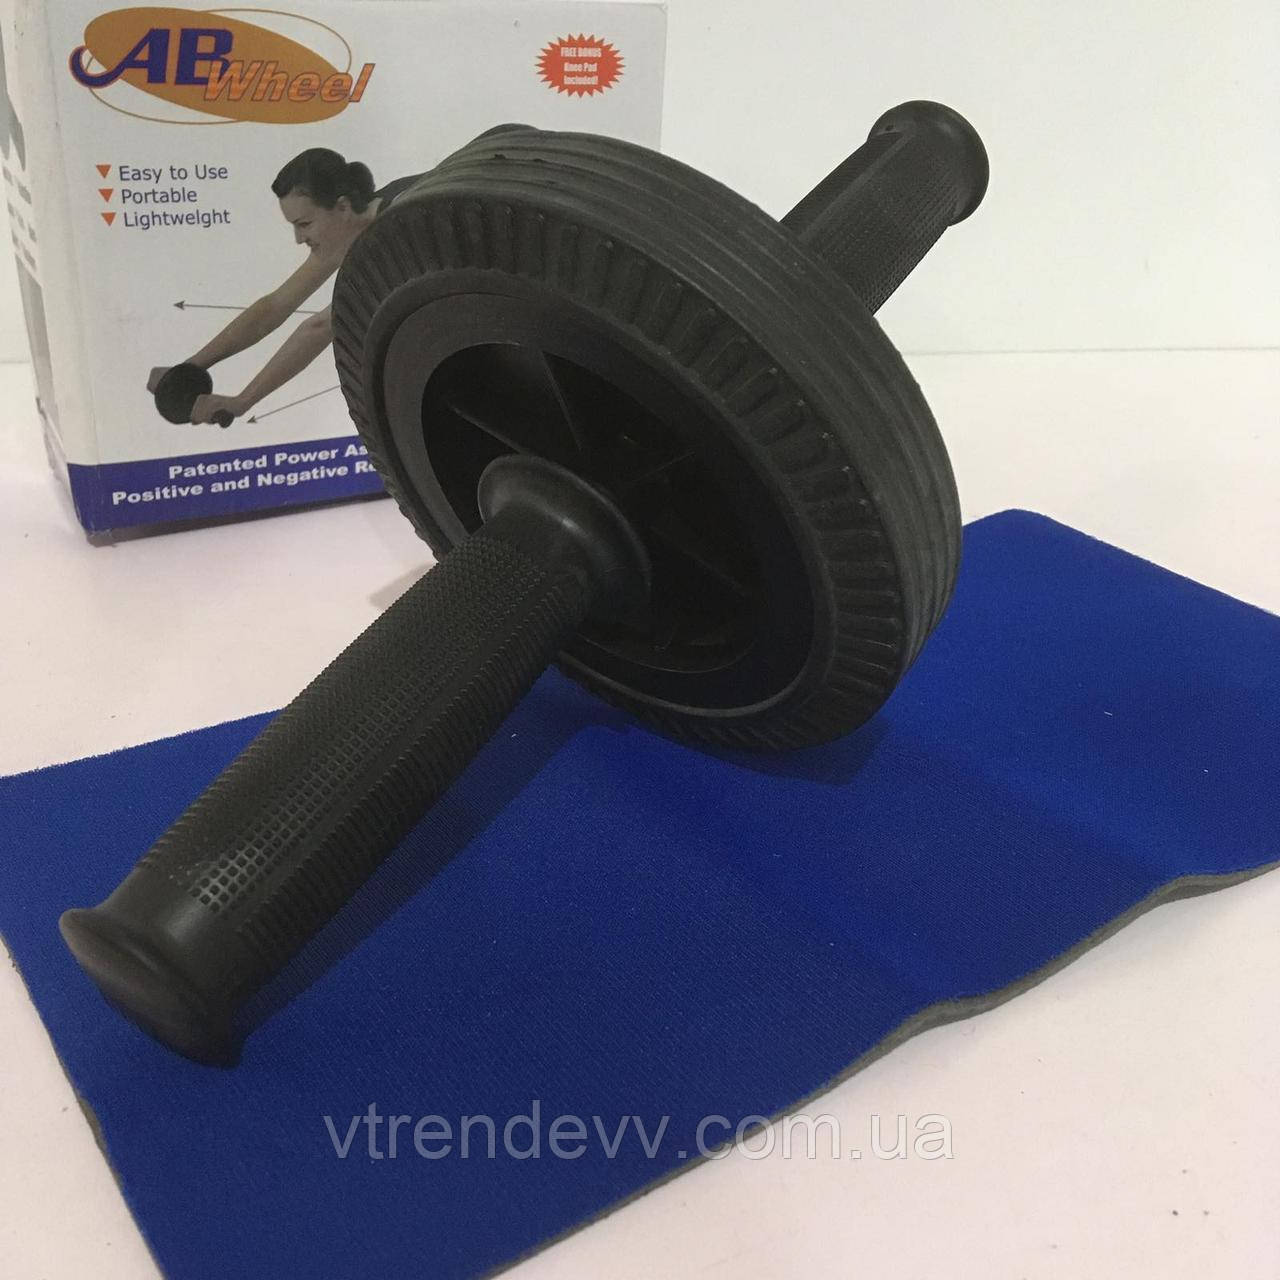 Тренажер ролик для пресса + коврик  AB Wheel 15см